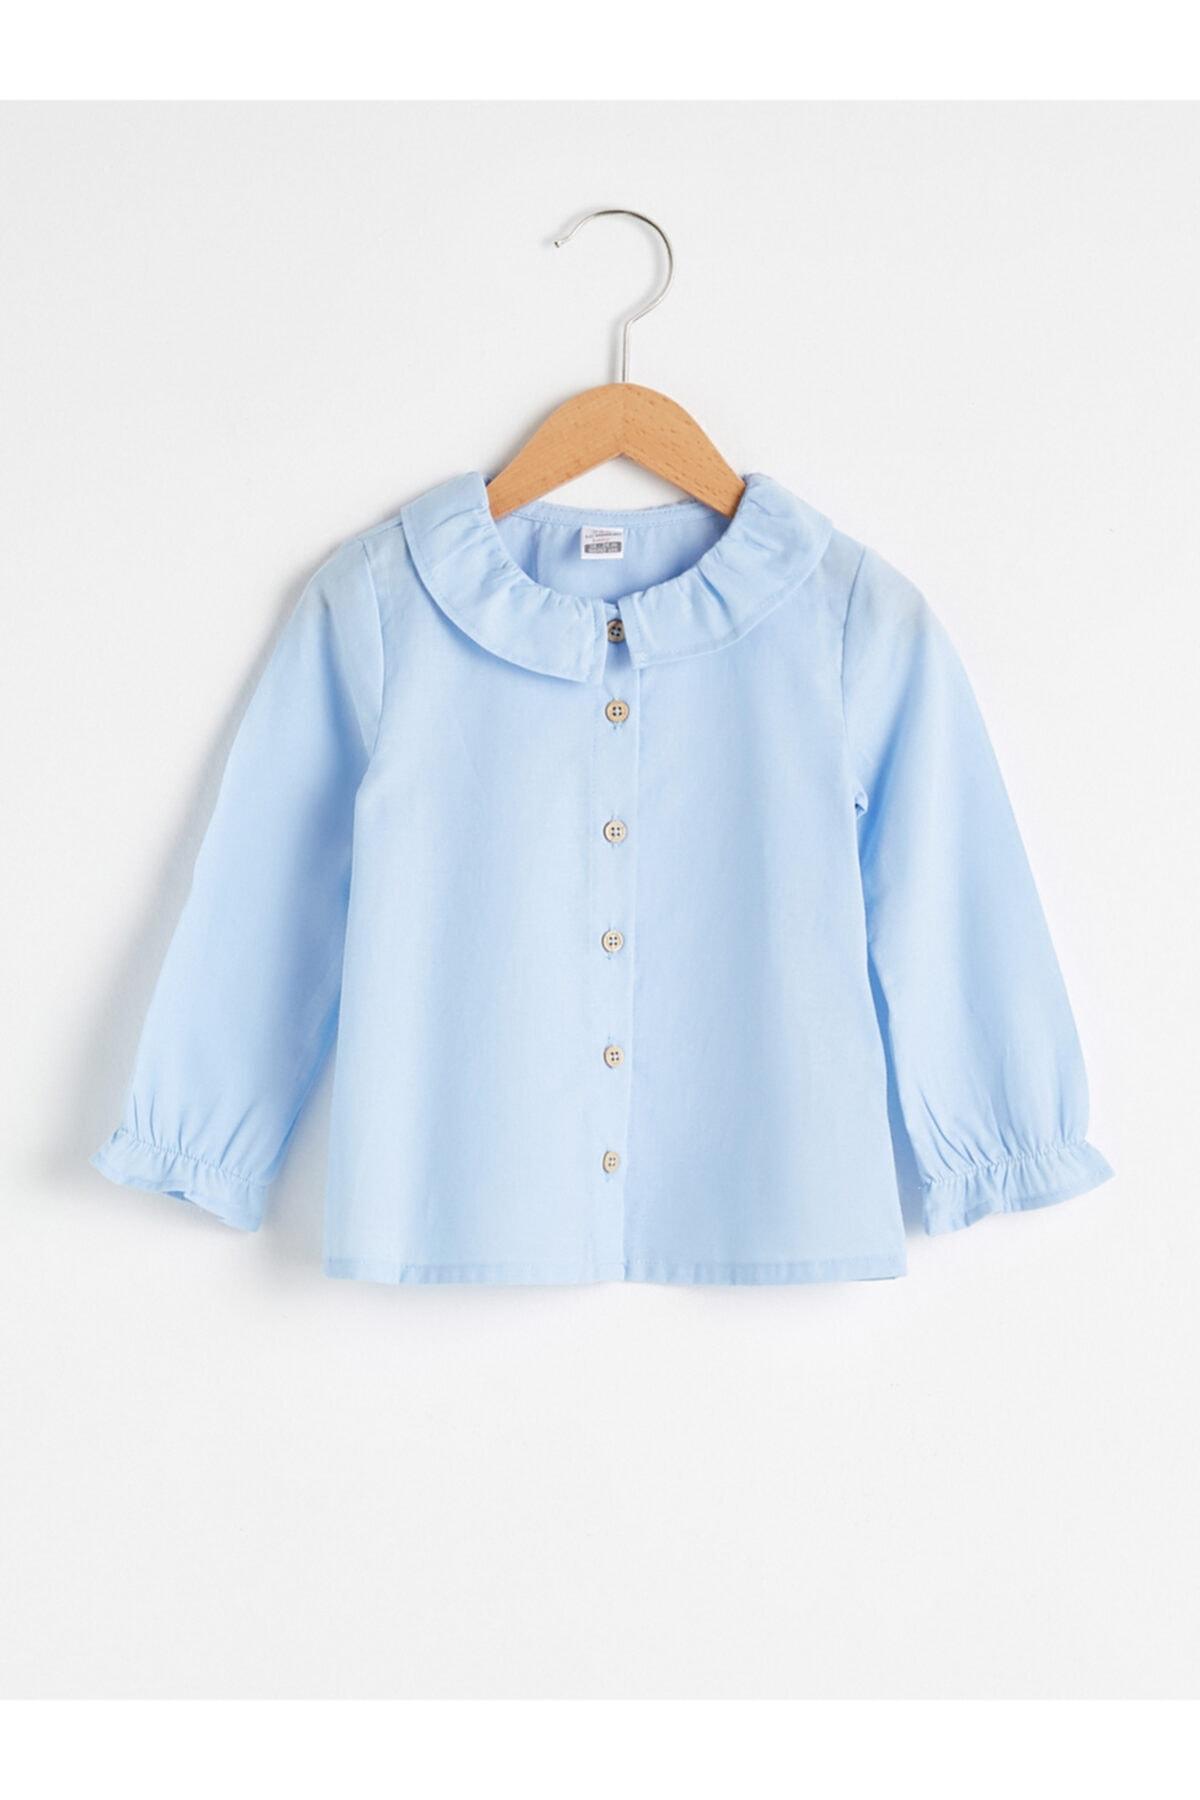 LC Waikiki Kız Bebek Mavi Gömlek 1